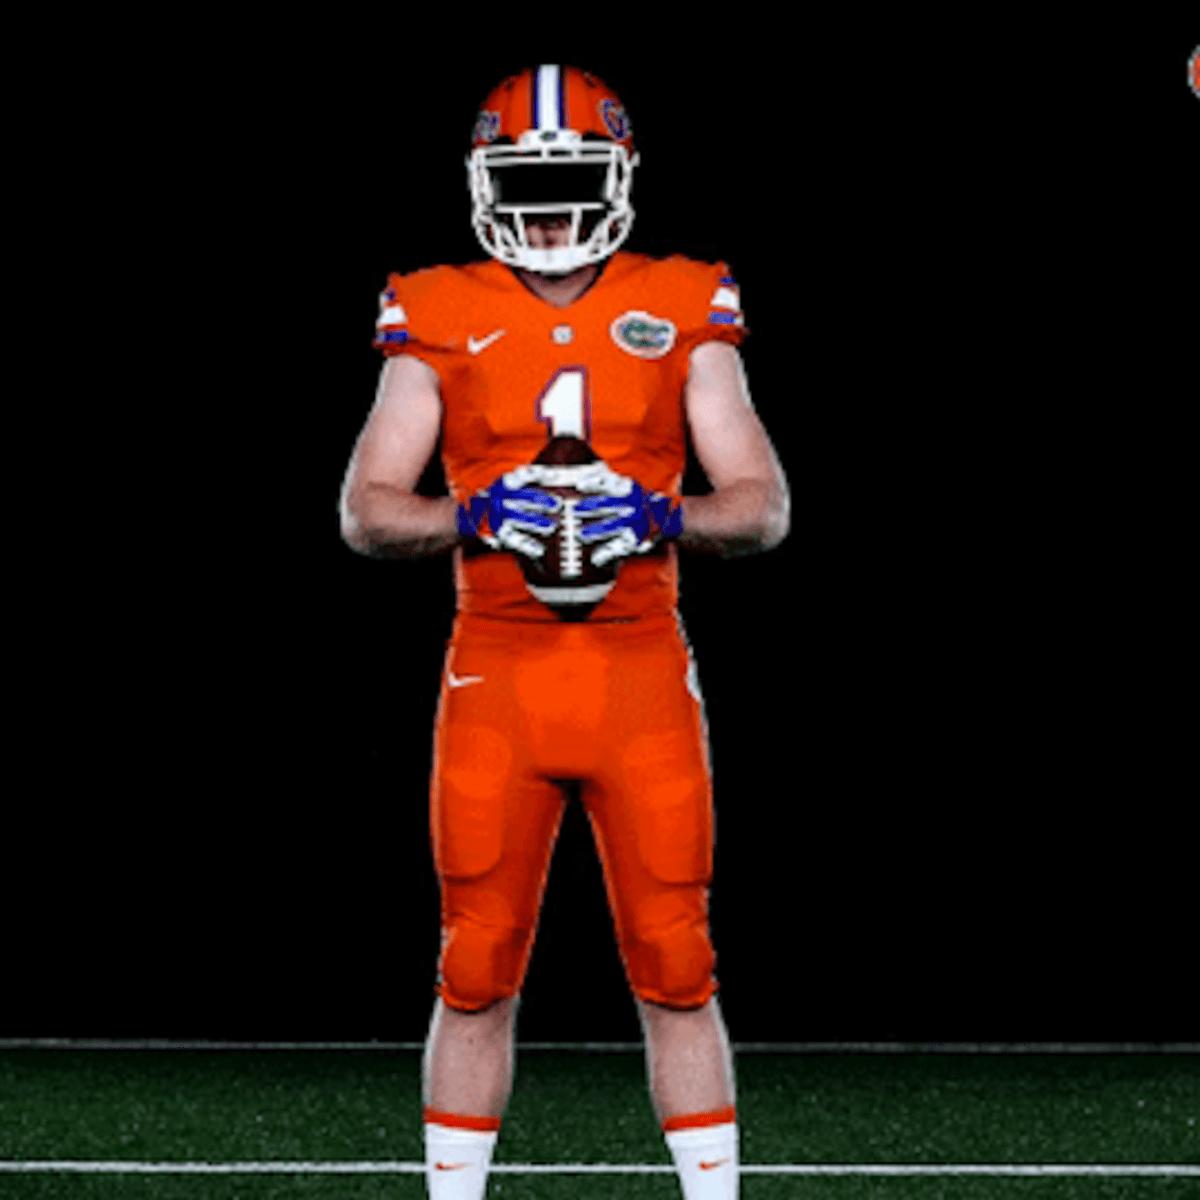 Florida Gators: Team unveils all-orange jerseys - Sports Illustrated